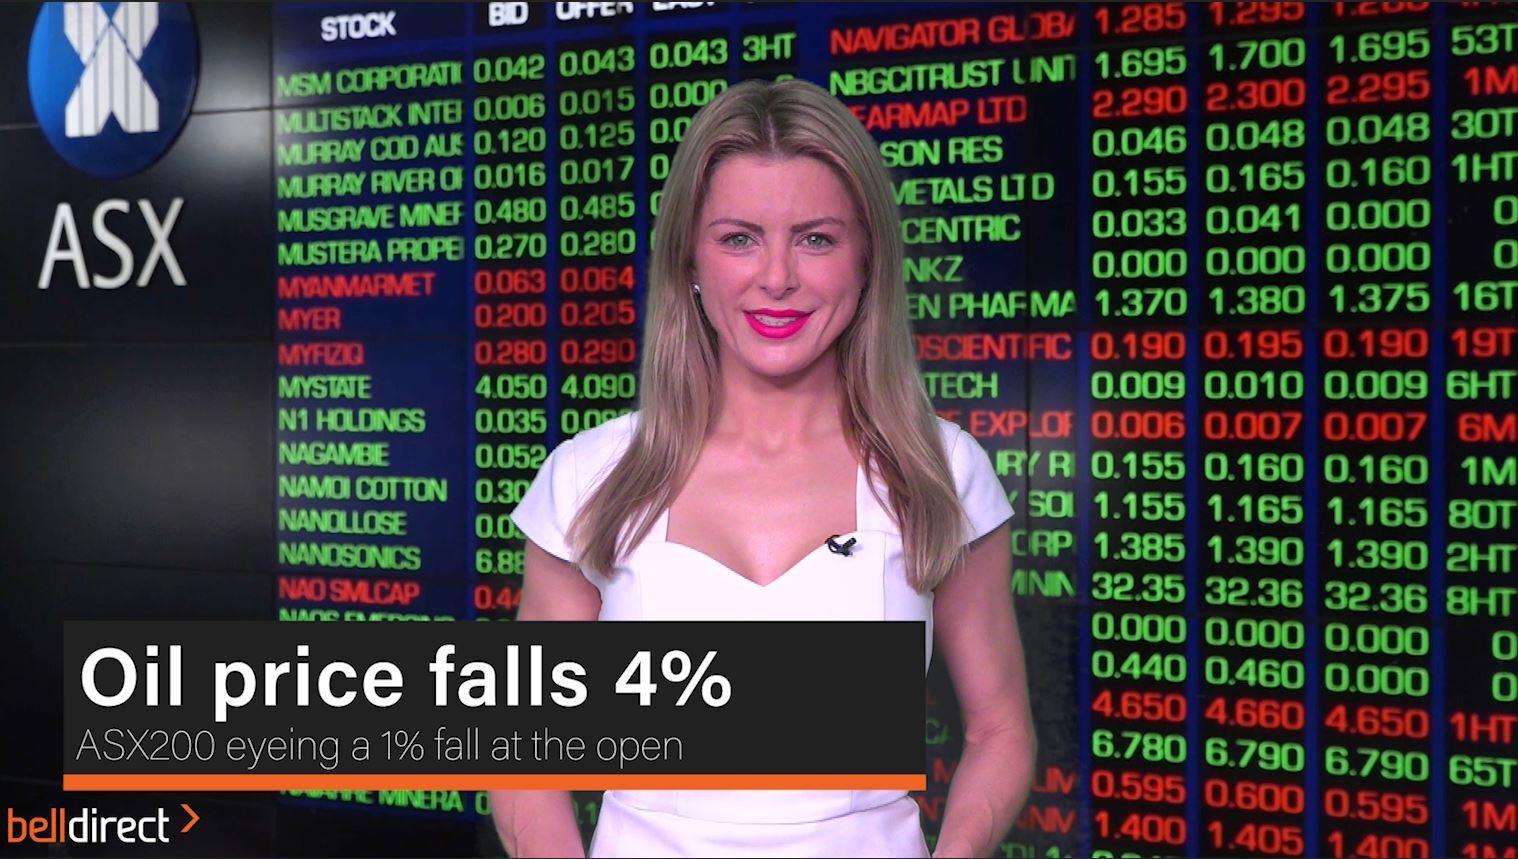 Oil price falls 4%